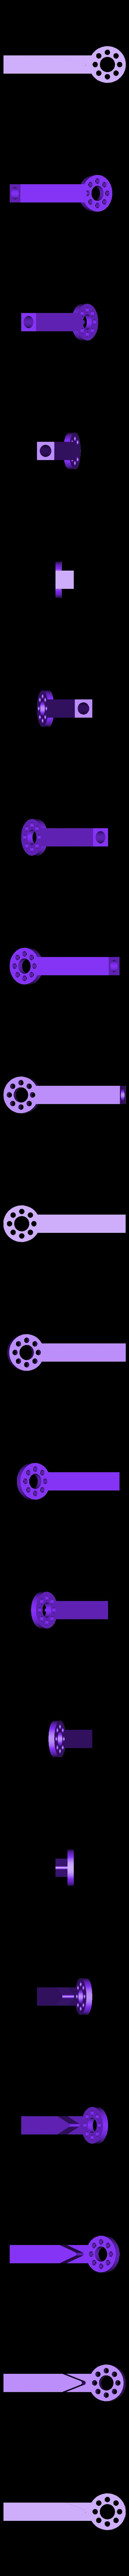 pendulTop.stl Download free STL file The First Clock • 3D print design, JacquesFavre